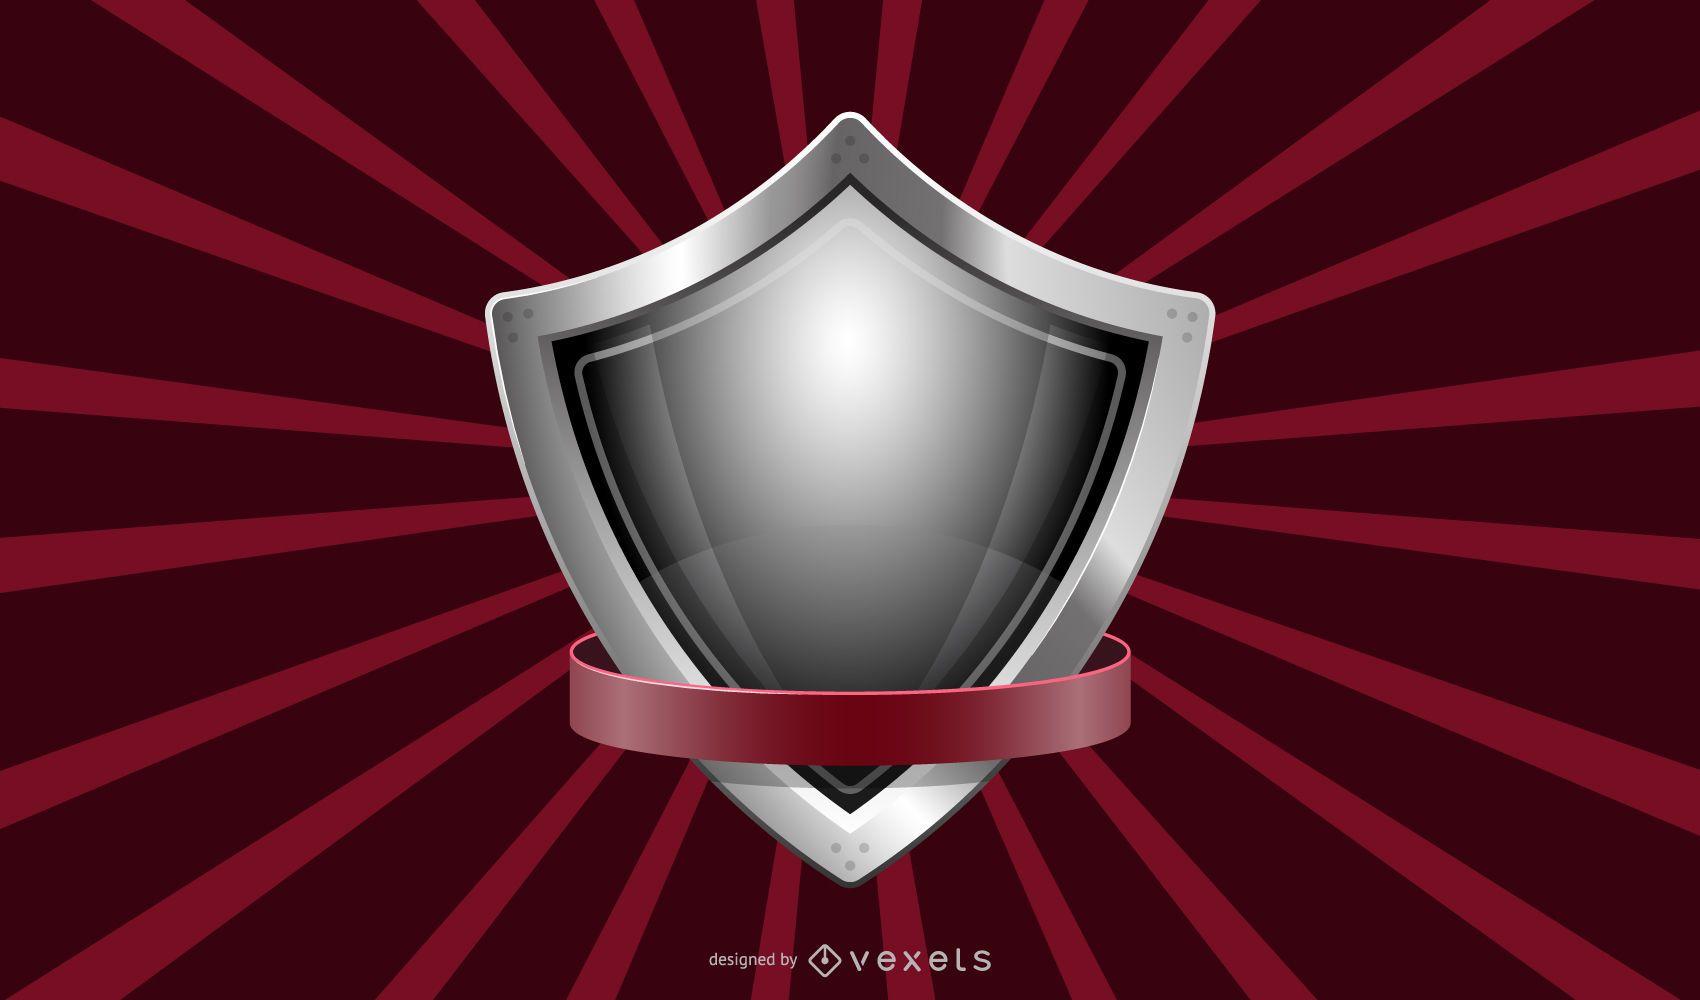 Diseño de fondo de escudo metálico